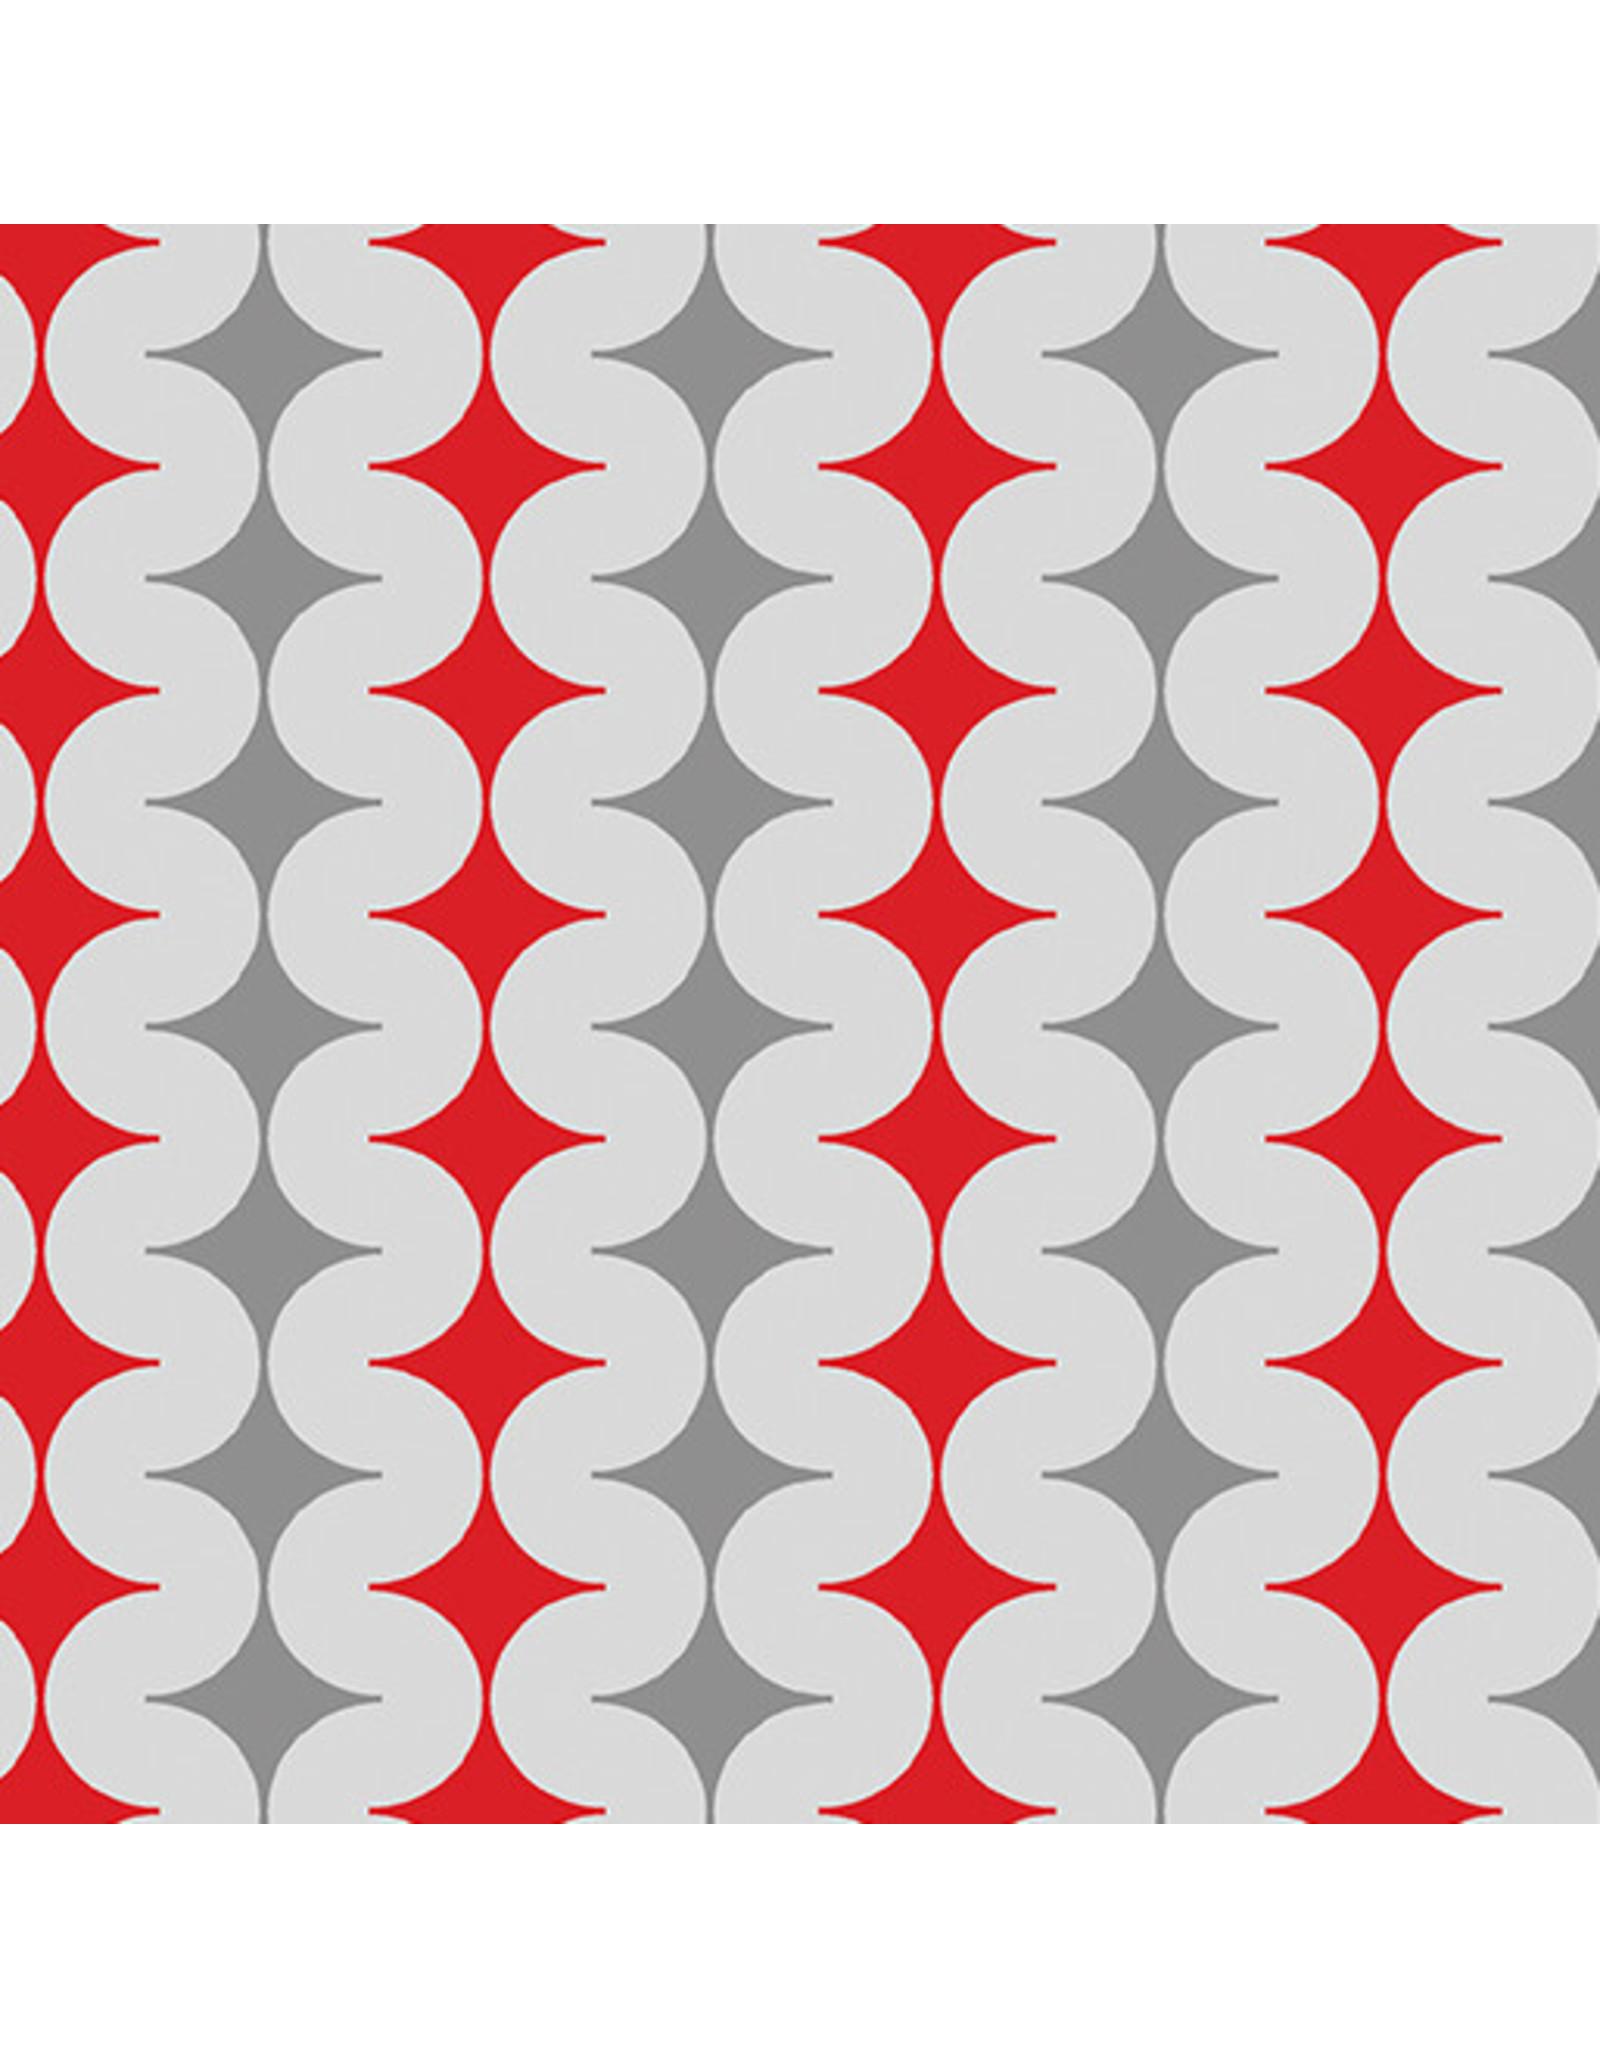 Contempo Geo Pop - Diamond Pop Gray/Red